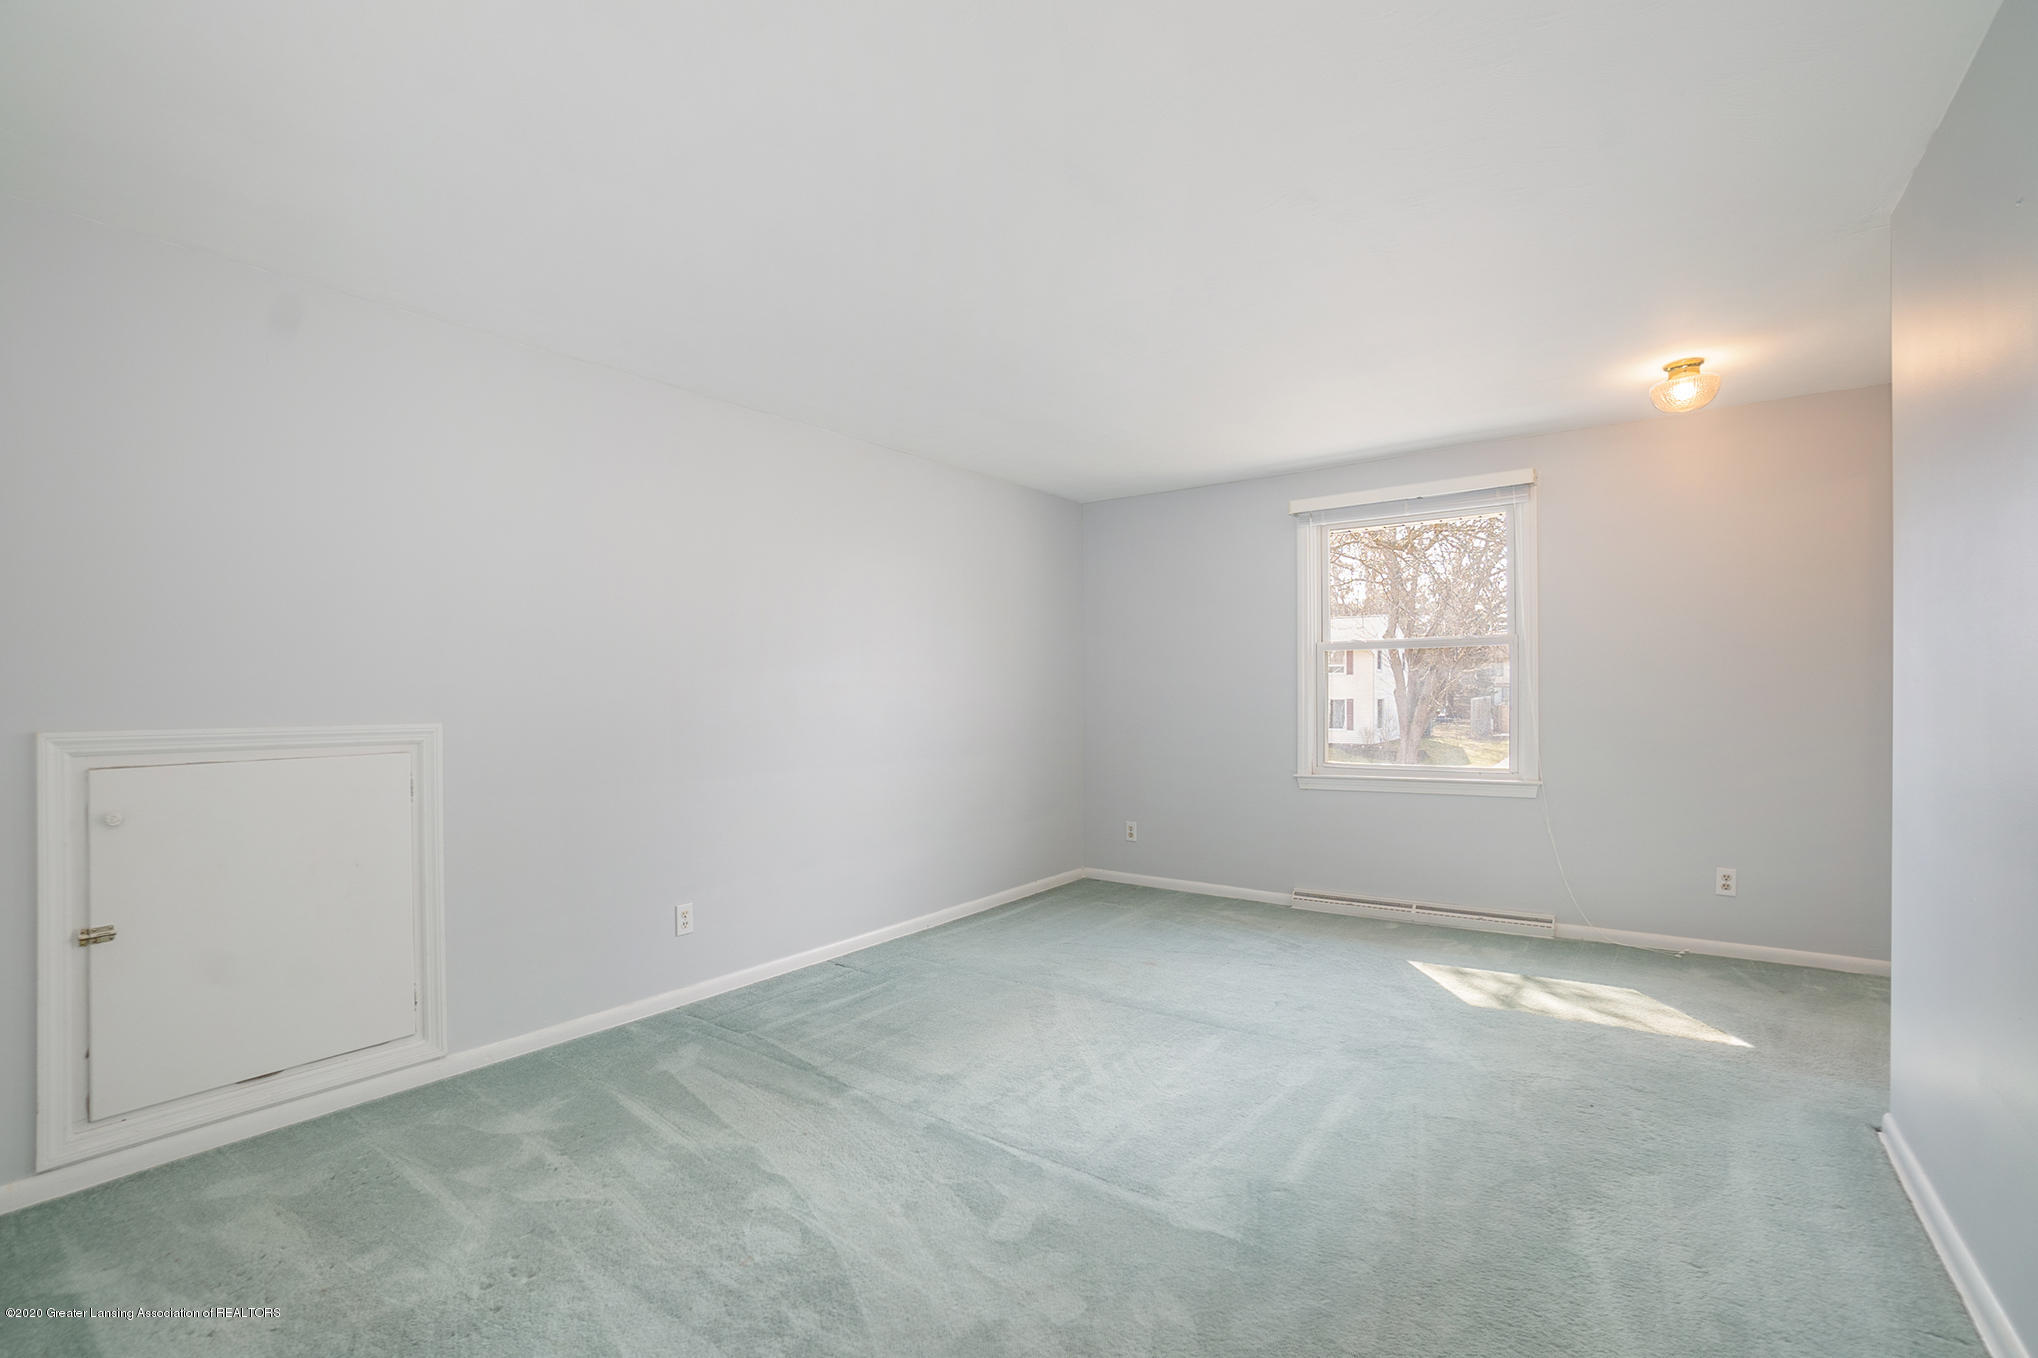 1266 Woodingham Dr - Bedroom 2 - 31